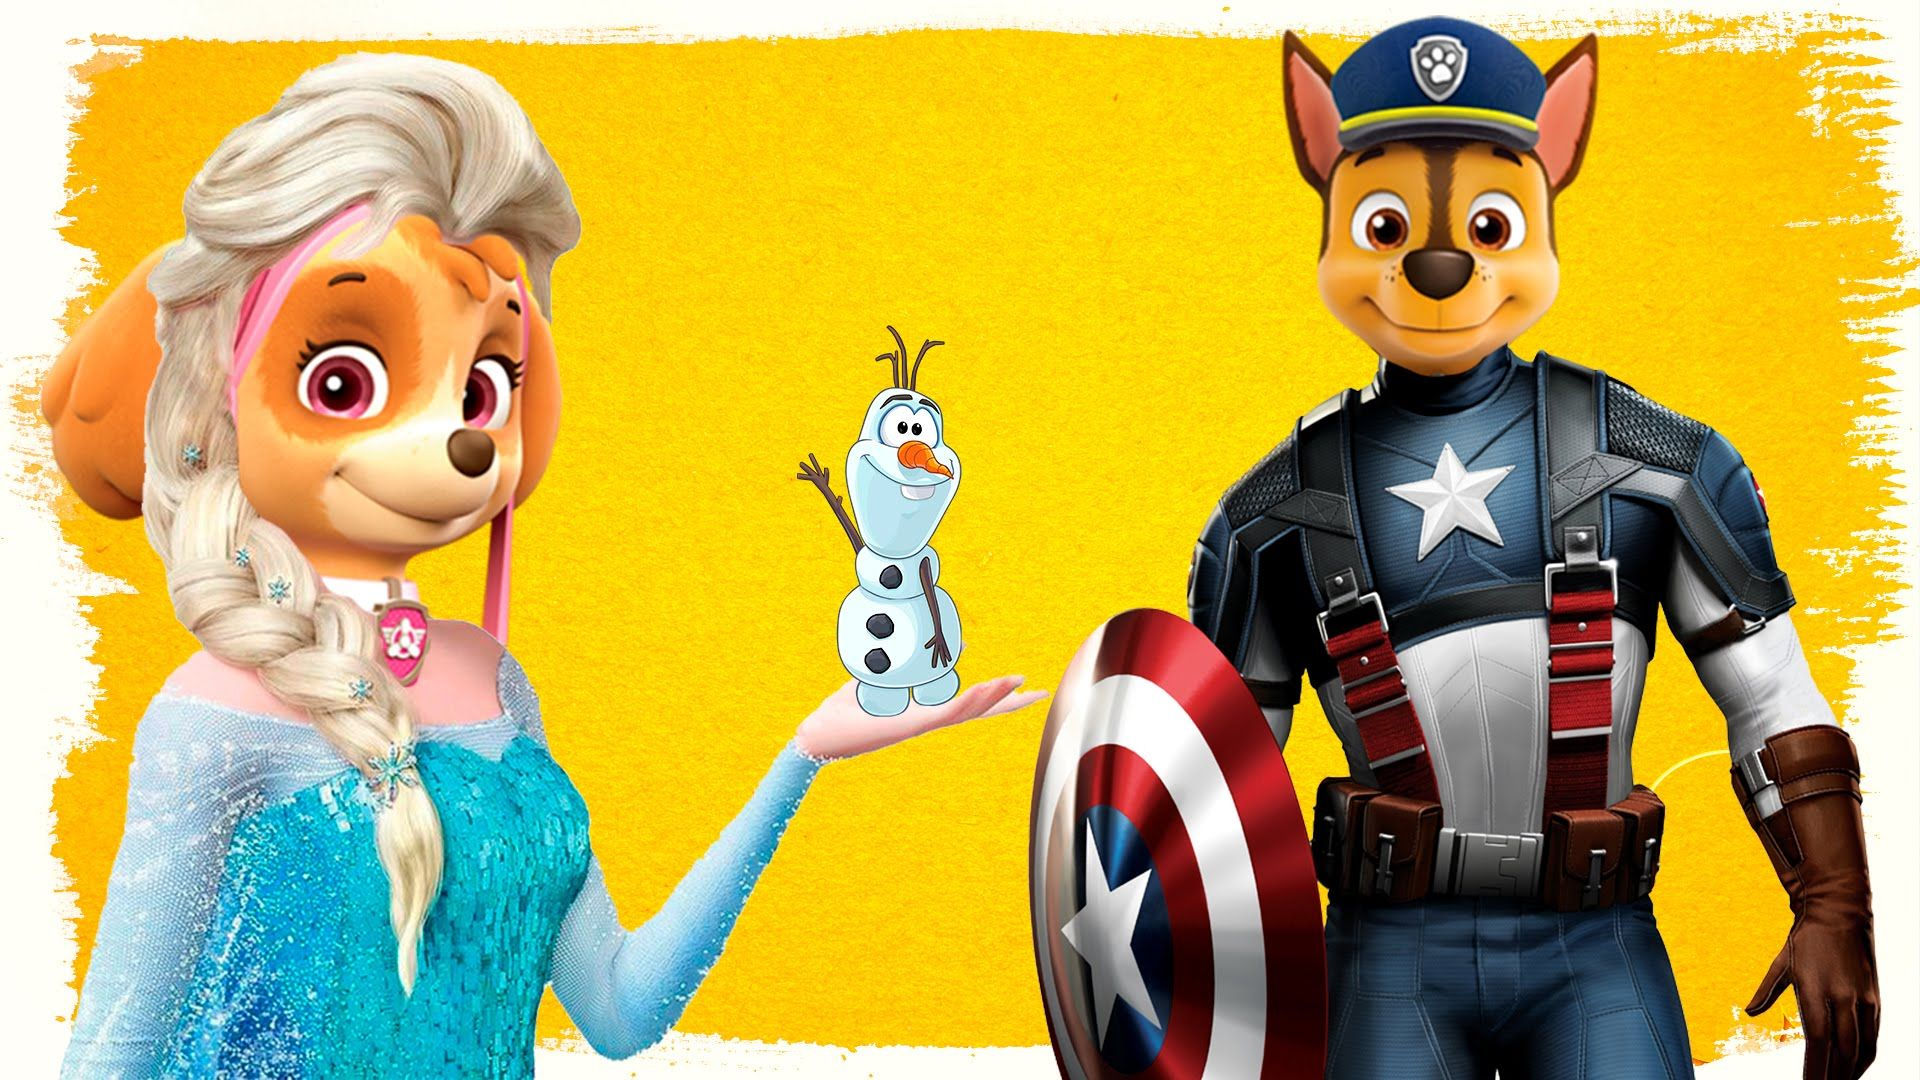 PAW Patrol Disney Frozen Elsa Captain America | Skye and Chase ...